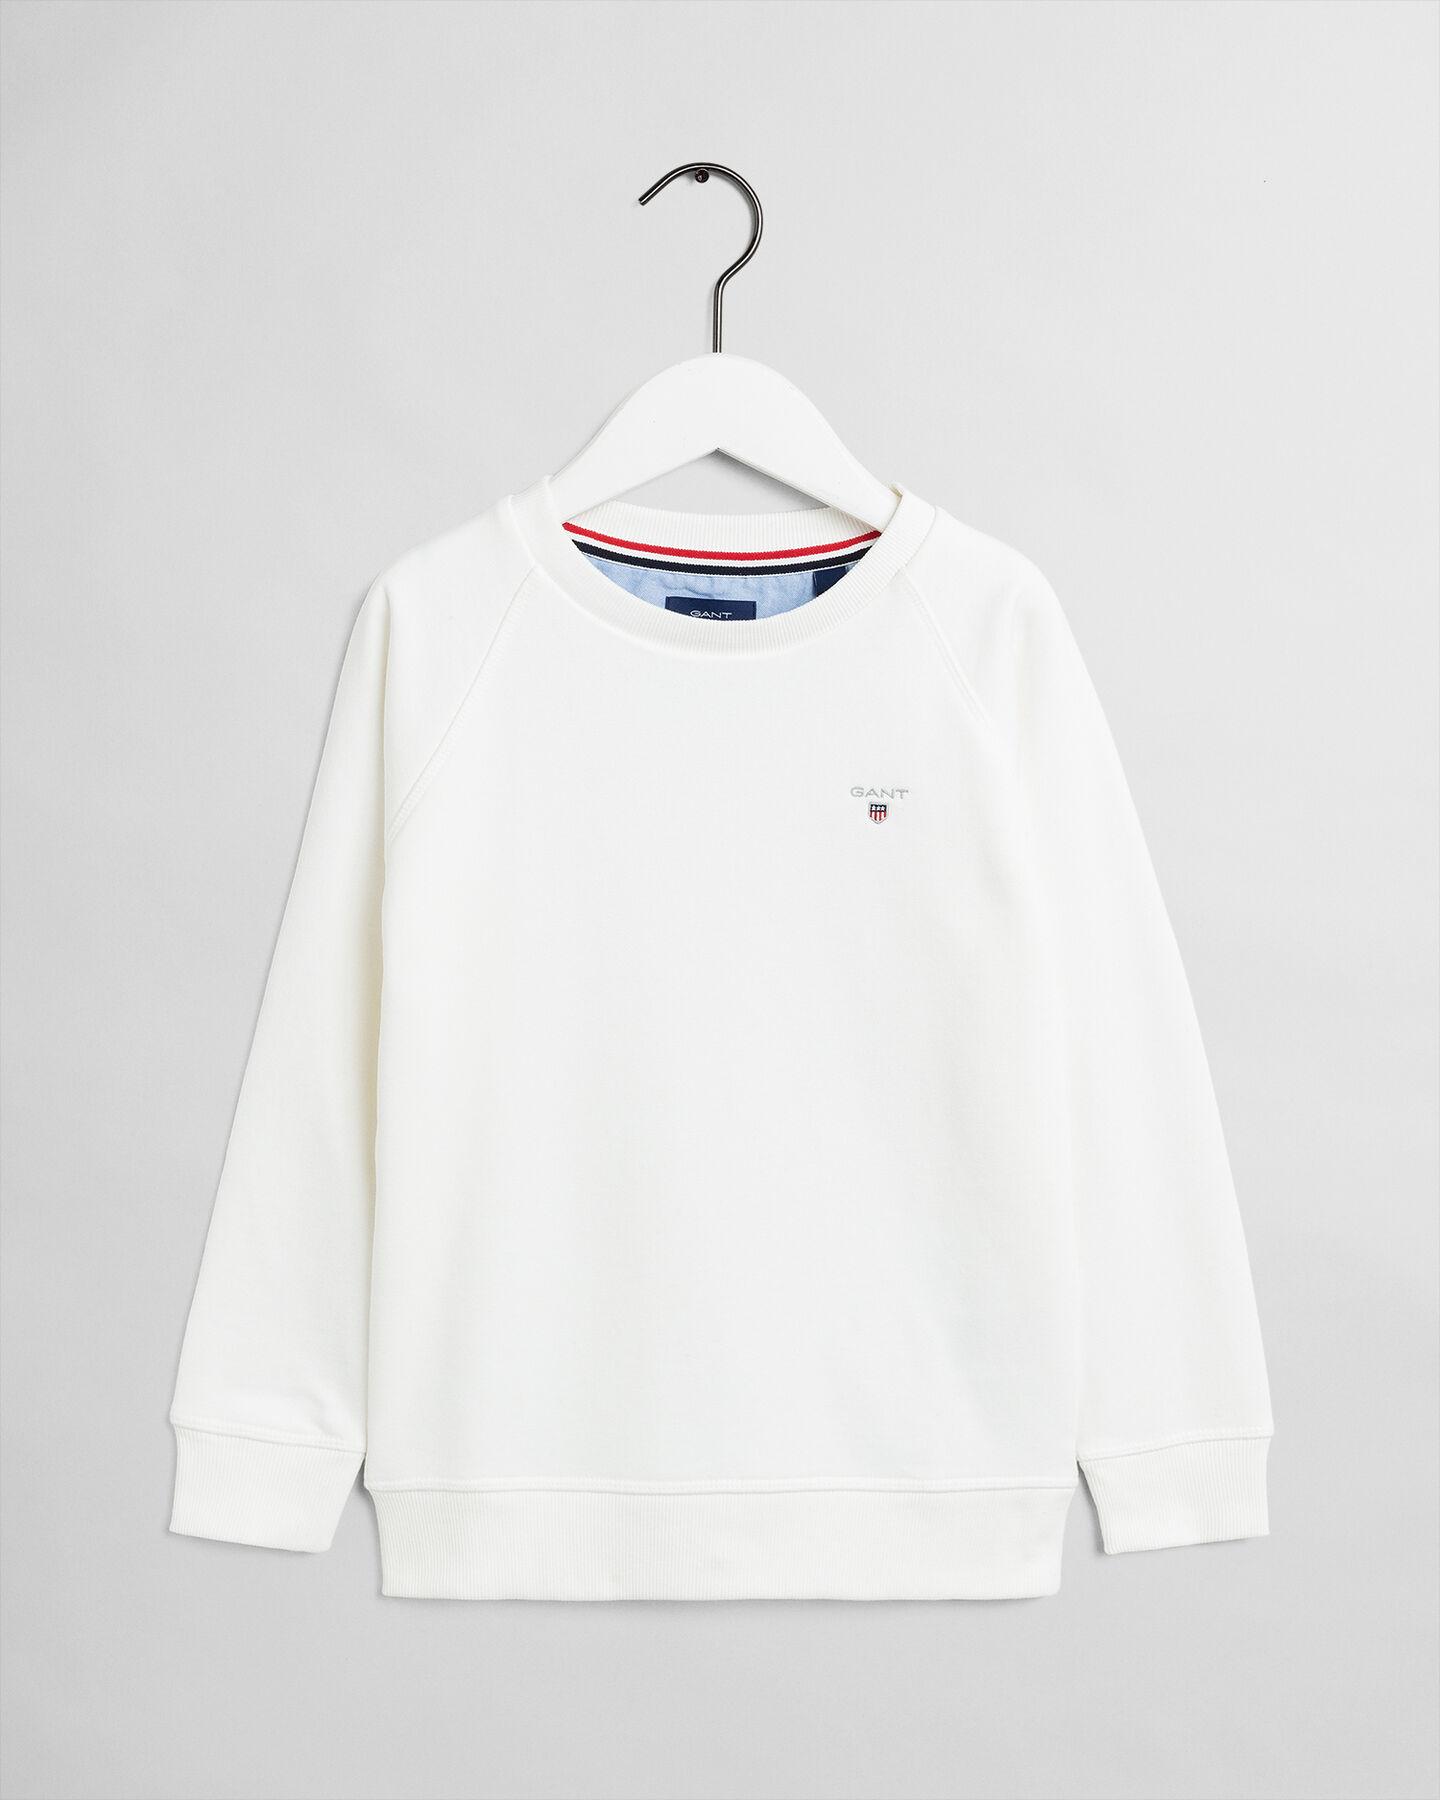 Teen Boys Original Rundhals-Sweatshirt